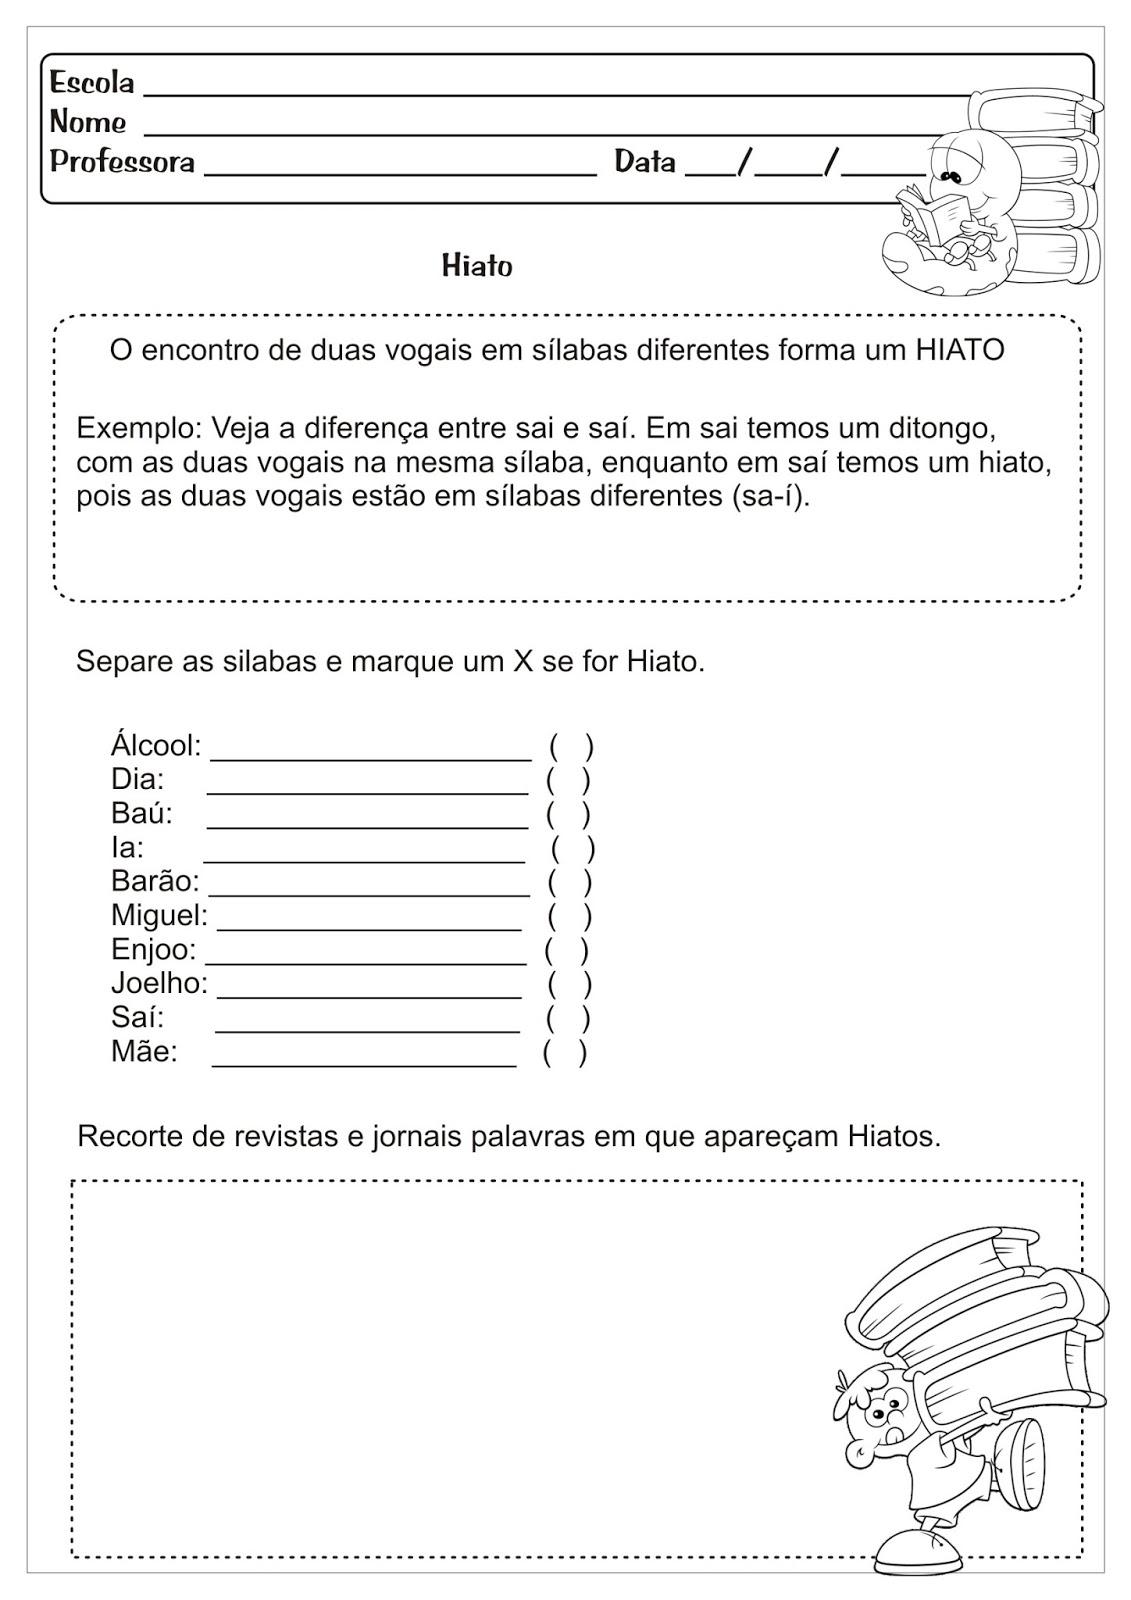 Atividades Educativas Ditongo Tritongo e Hiato Língua Portuguesa para Ensino Fundamental